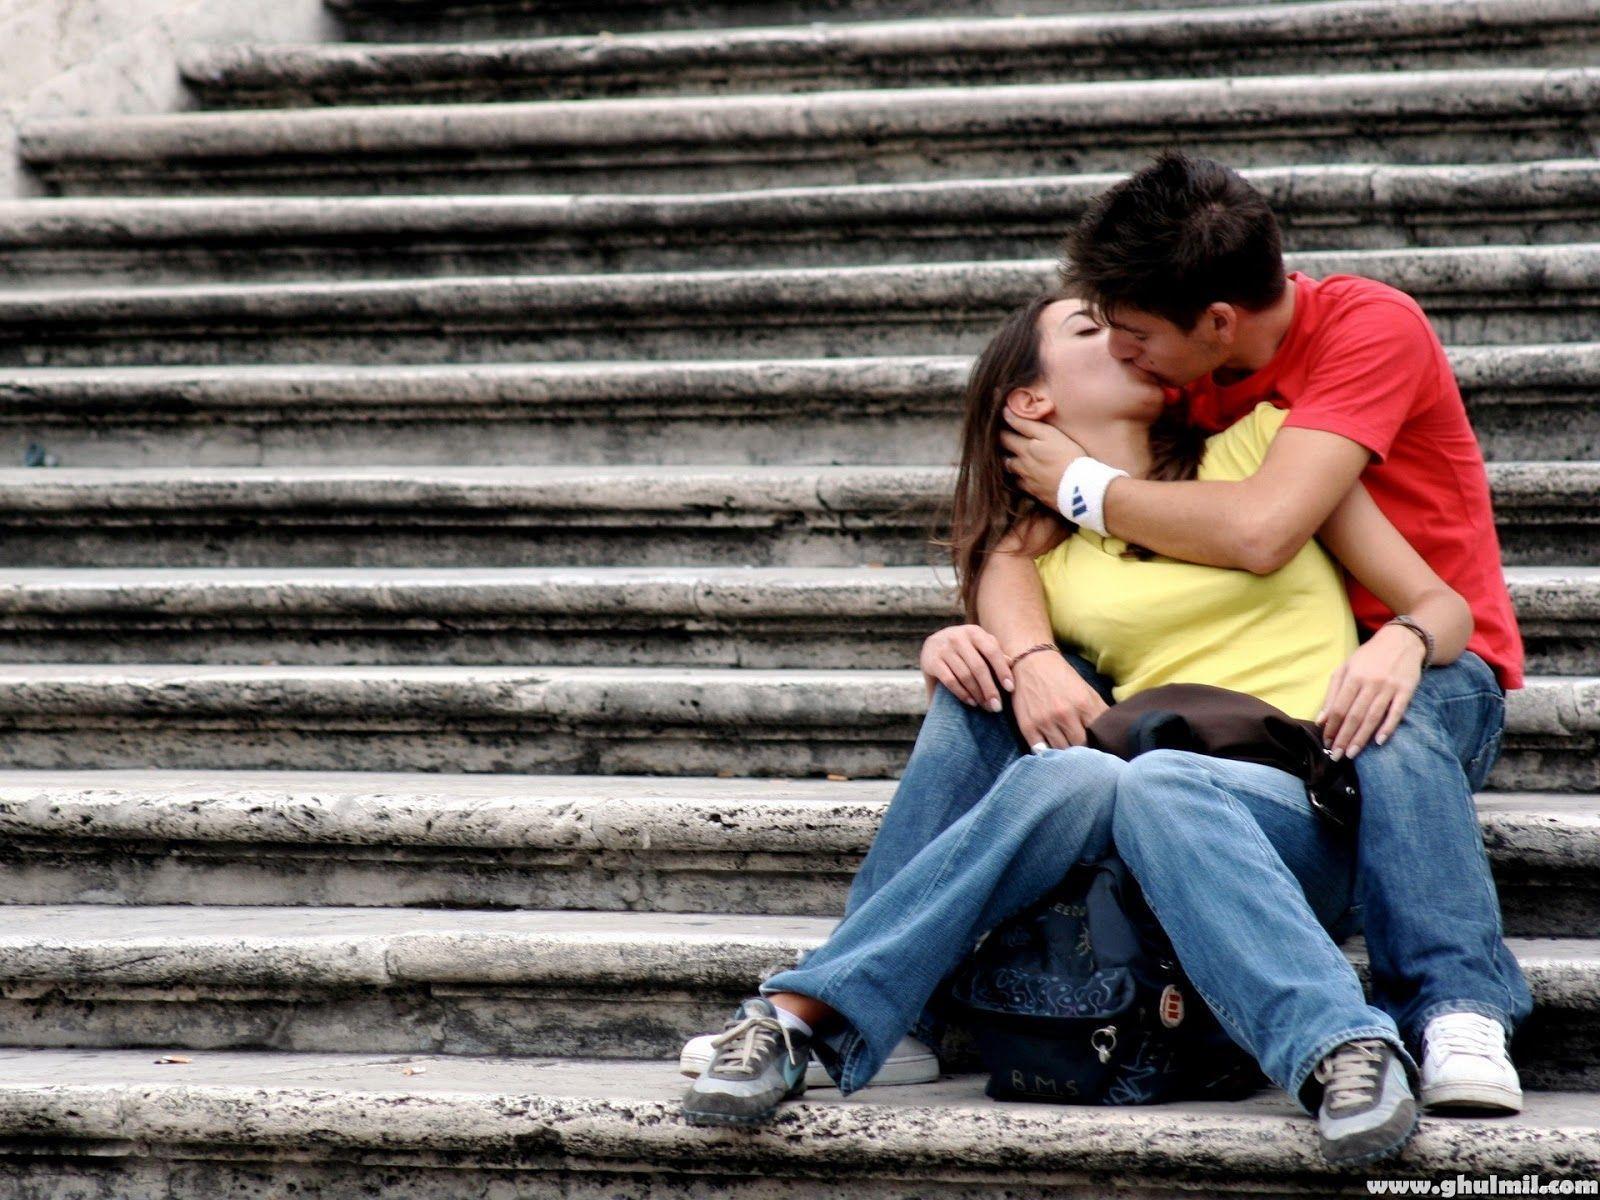 Lovely Kiss Wallpaper - WallpaperSafari